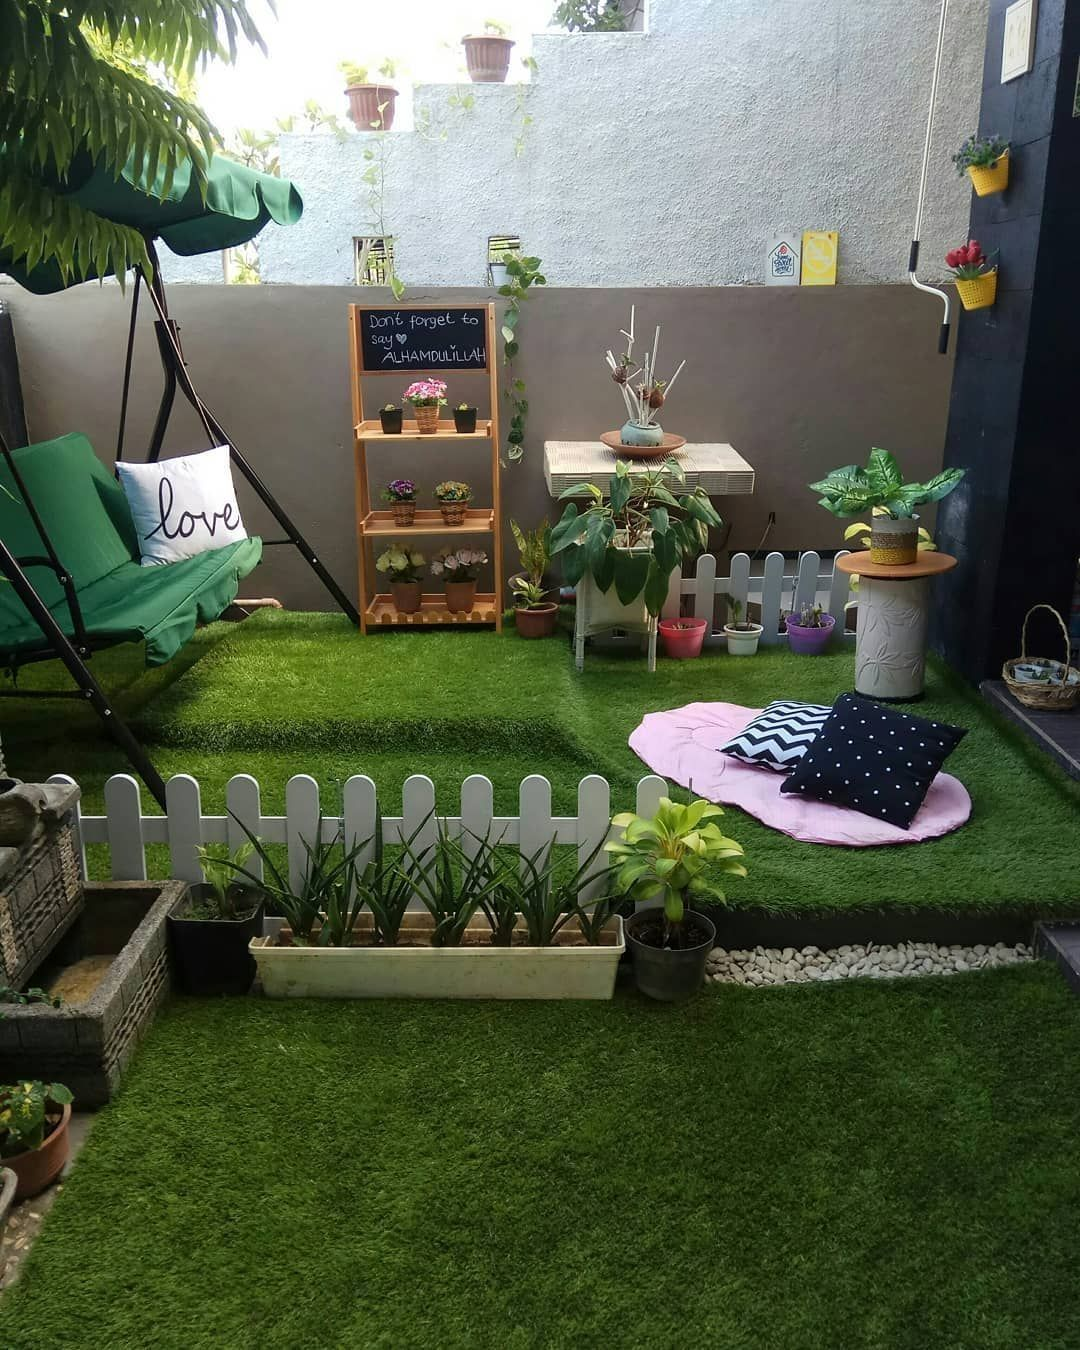 30 Fascinating Small Backyard Gardening Ideas With Indian Style Decoracion De Patio Exterior Decoracion De Patio Jardin De Interior Backyard garden ideas india